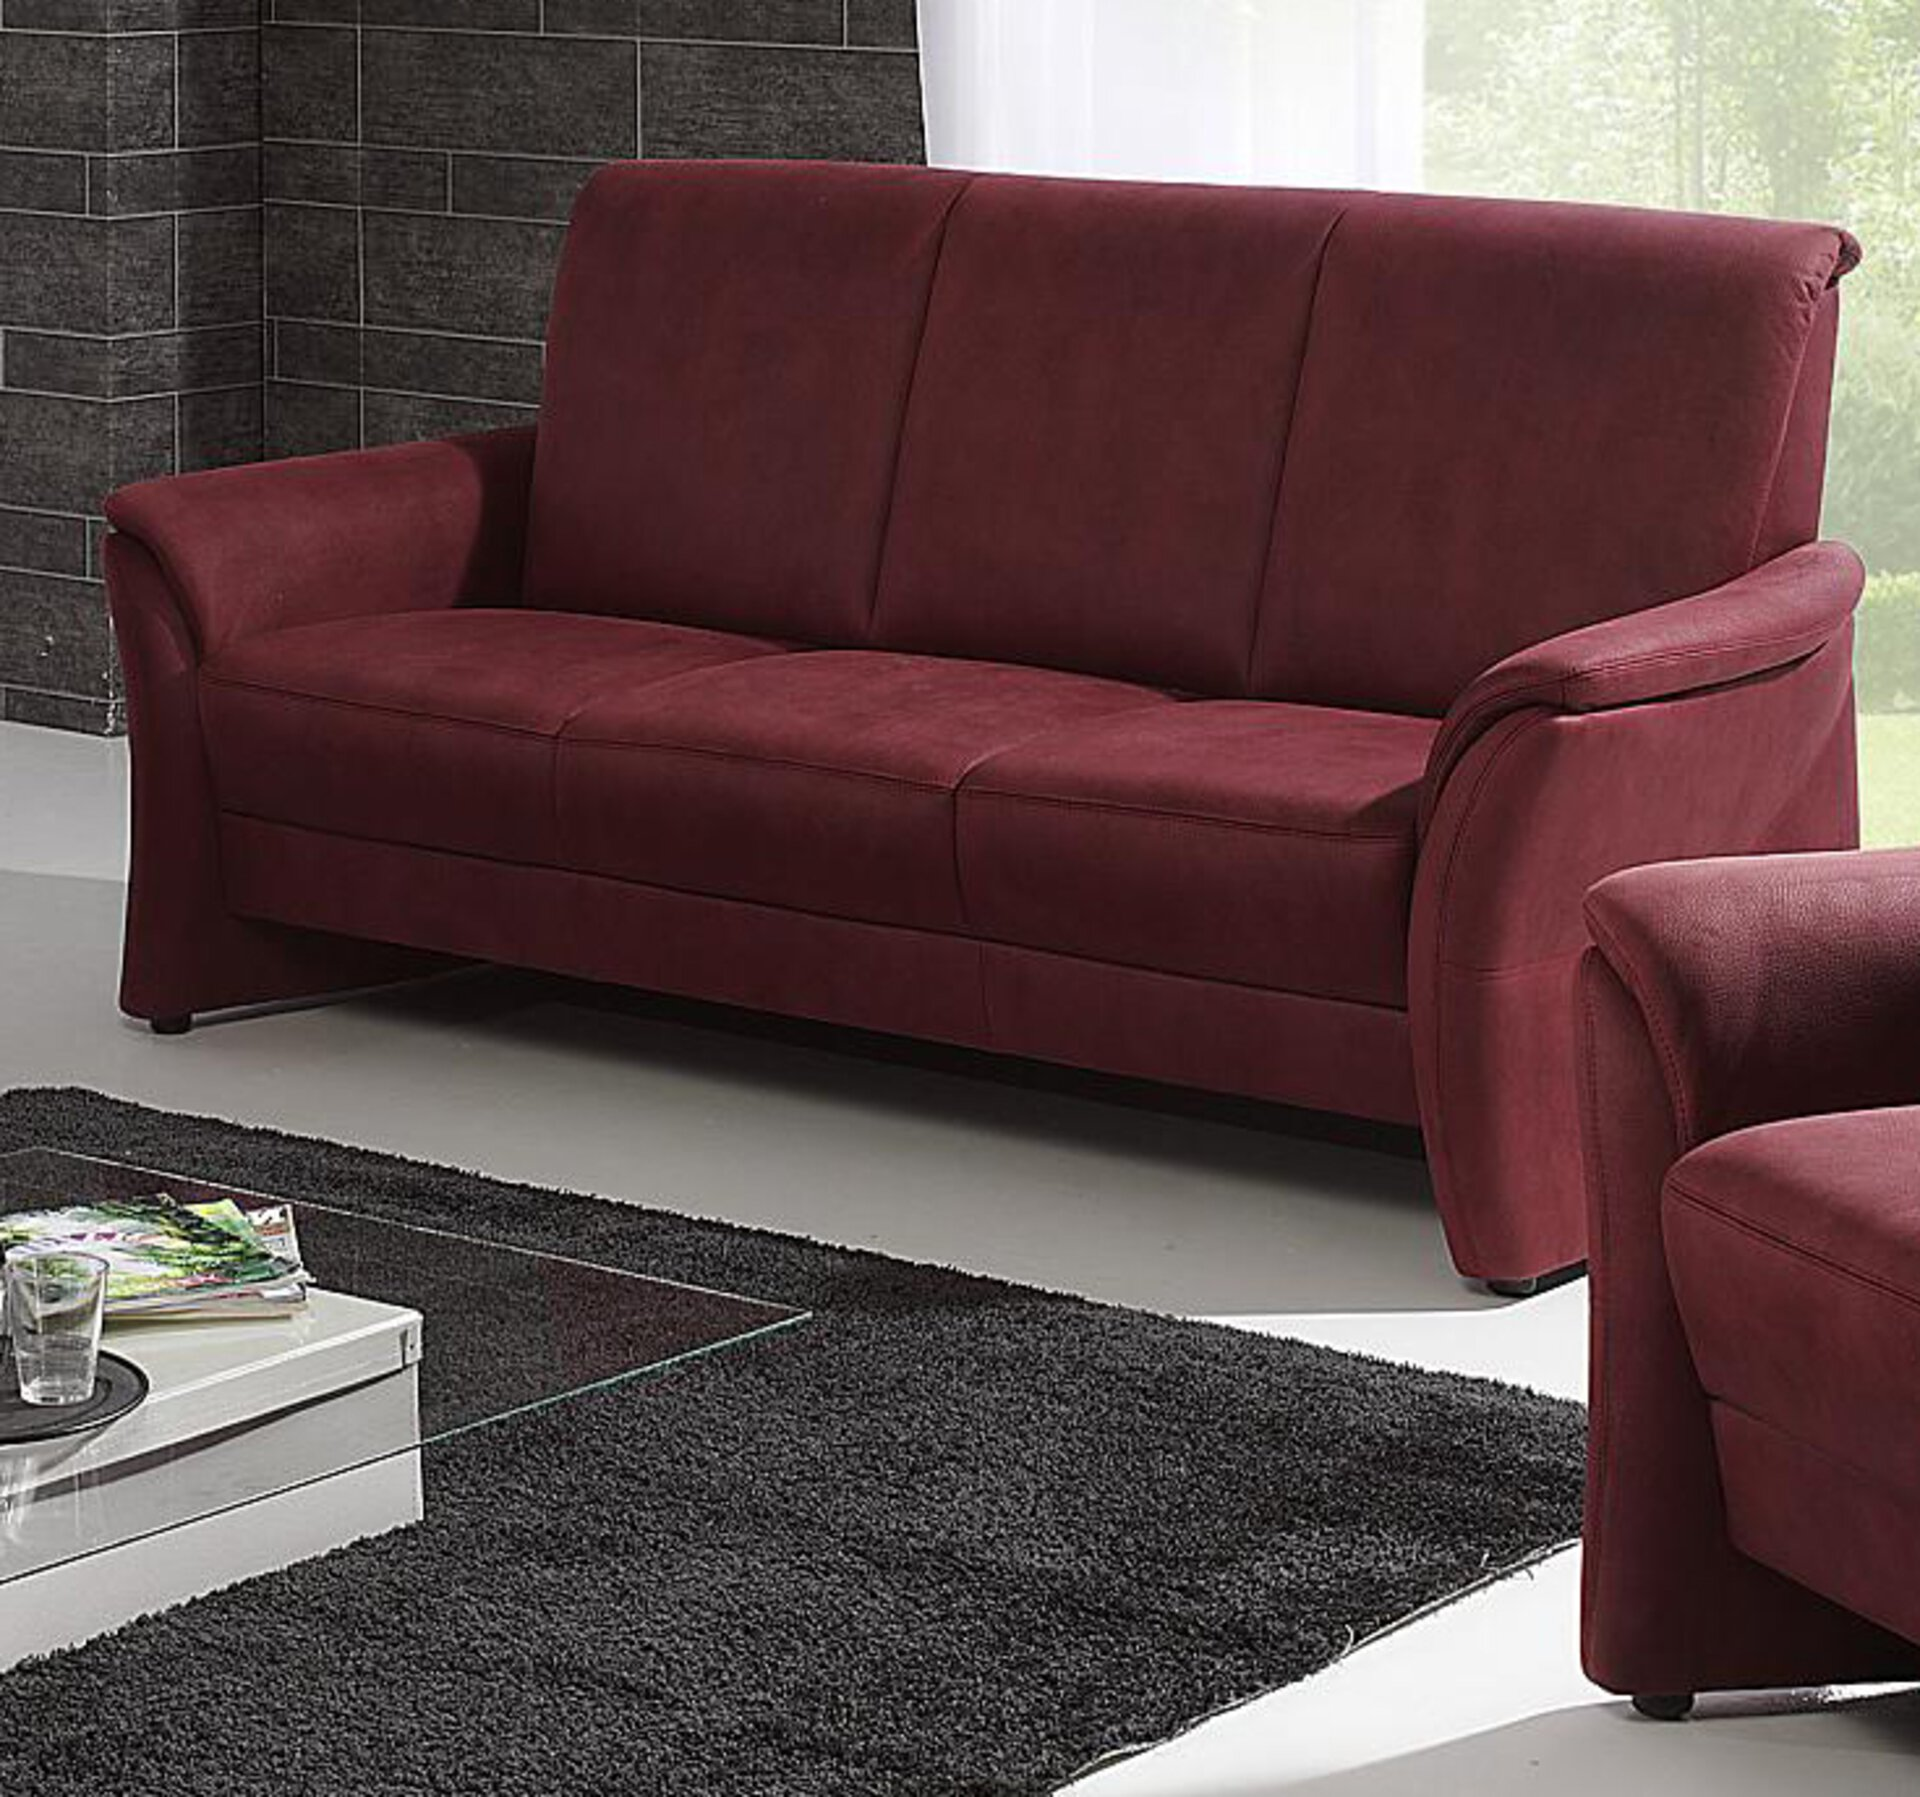 Sofa 3-Sitzer VOLKACH Arco Textil rot 89 x 96 x 188 cm